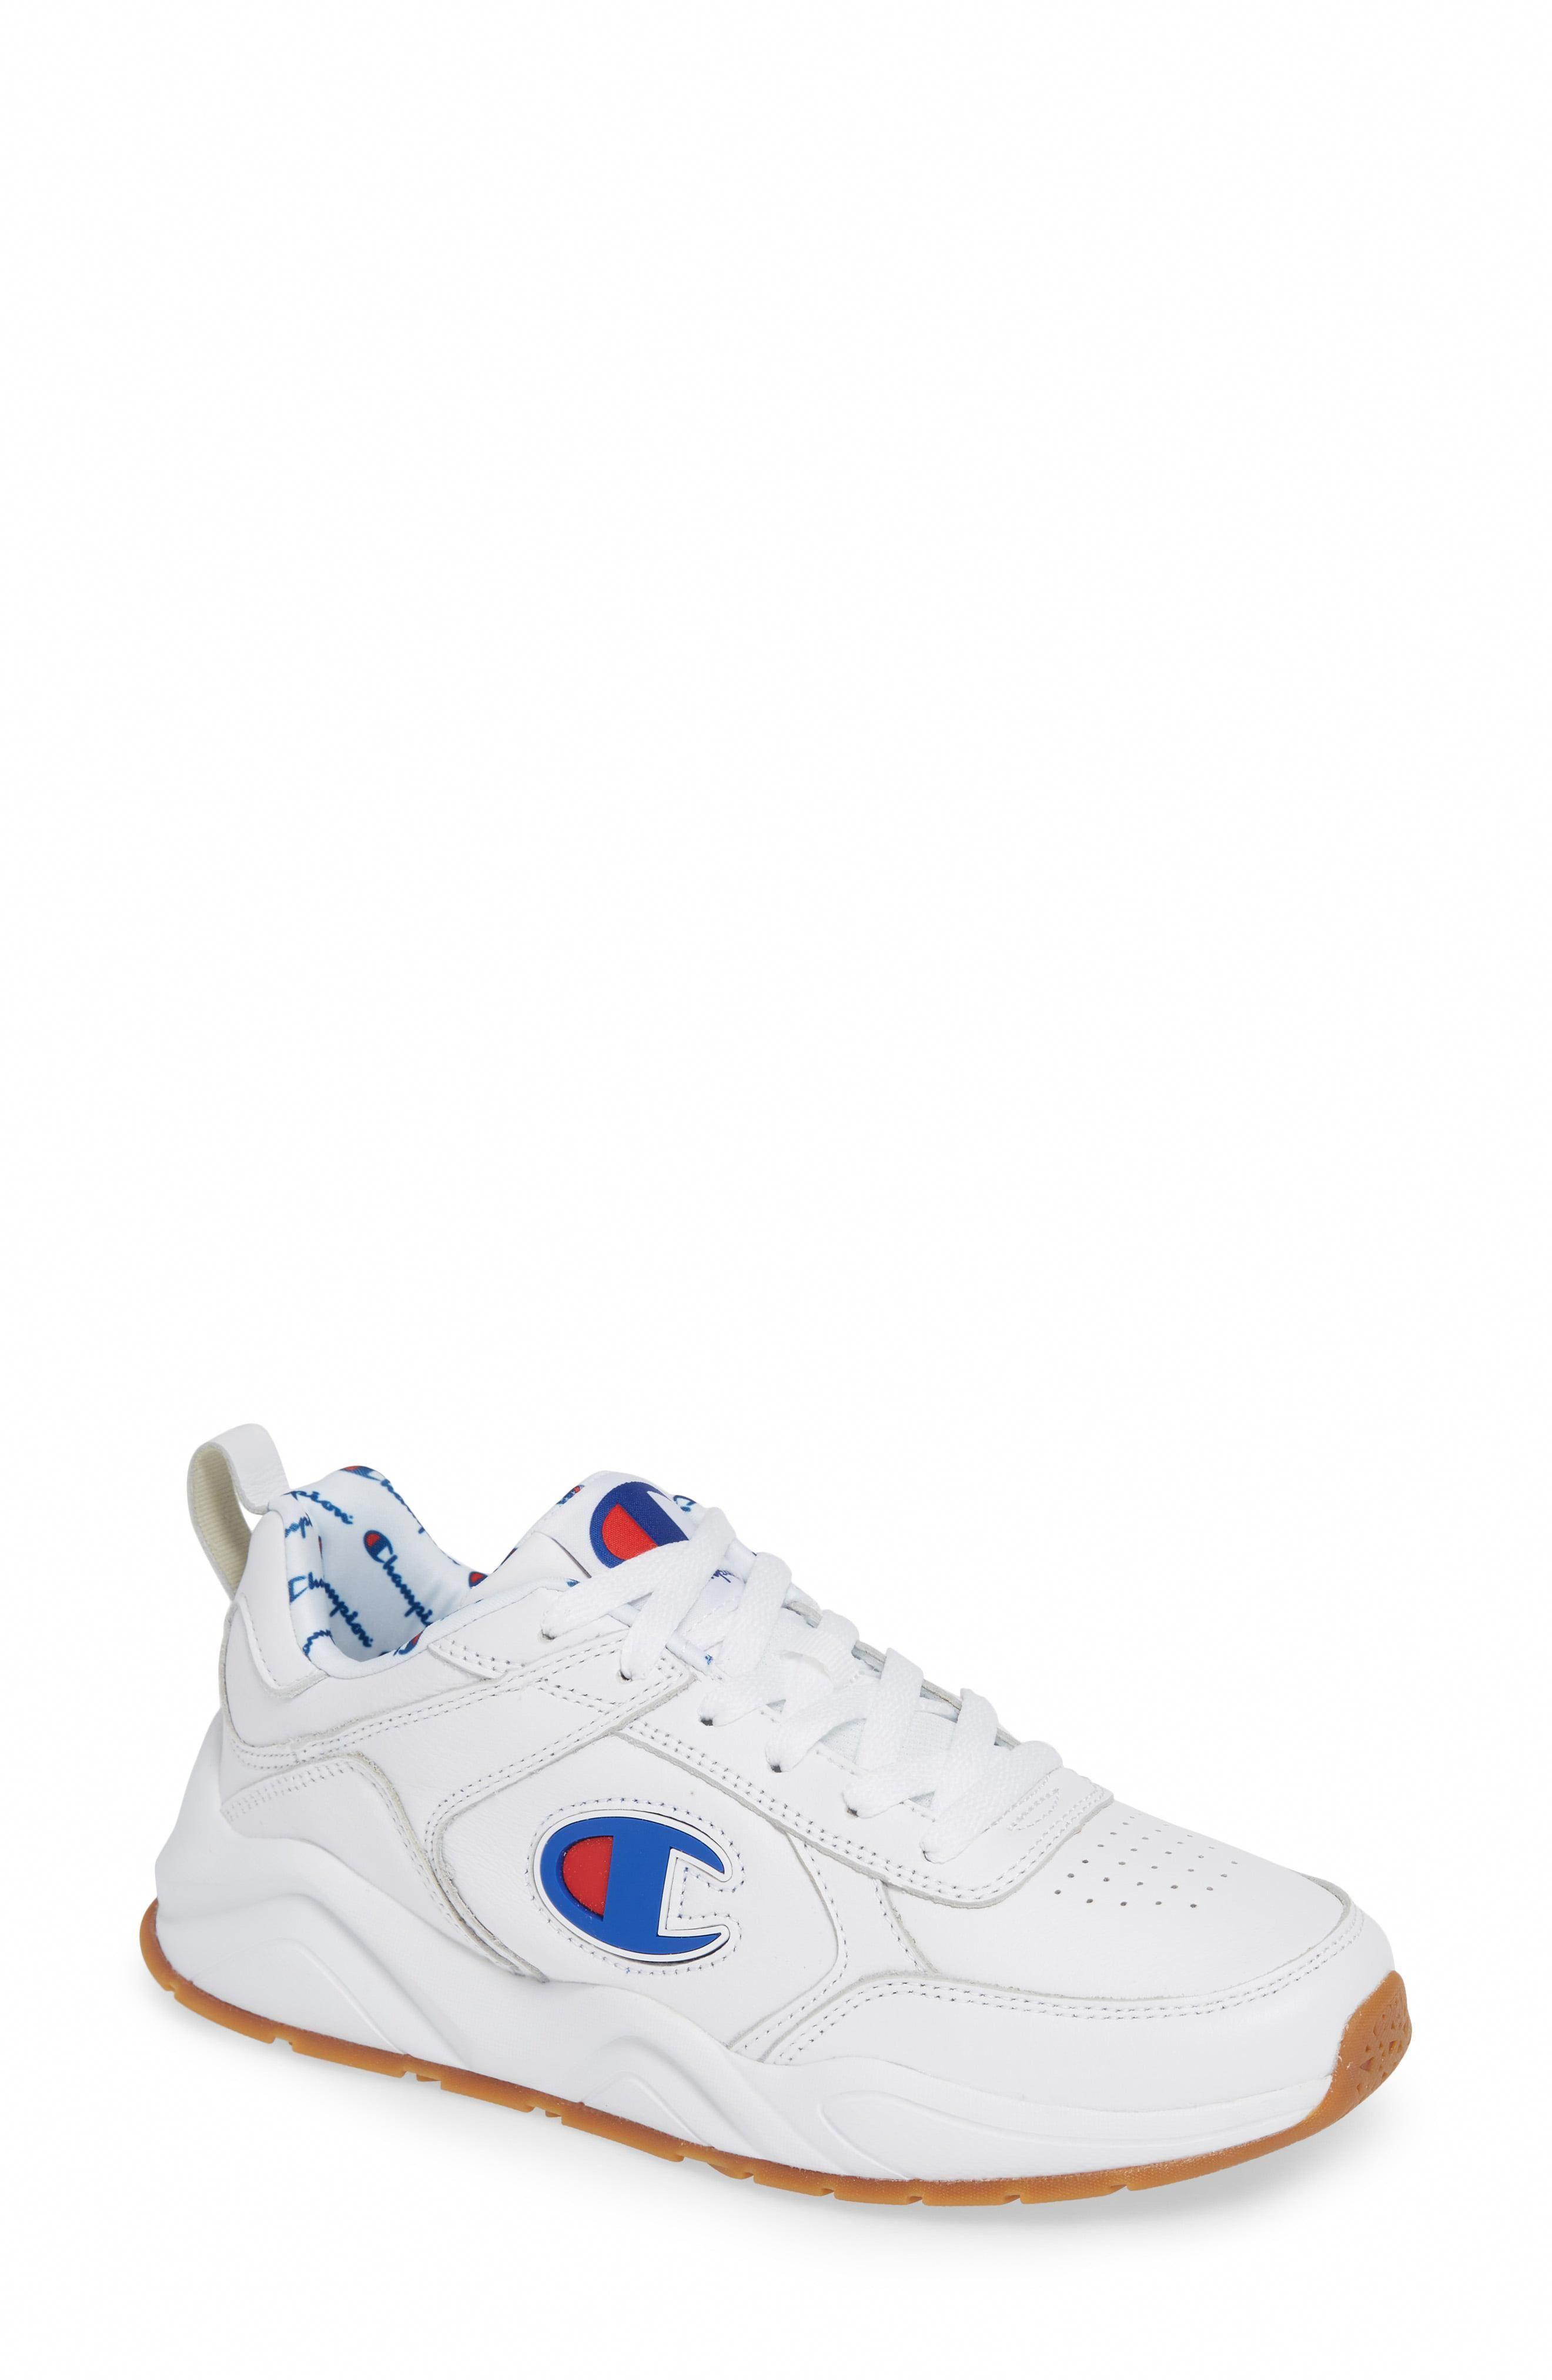 Women S Champion 93 Eighteen Sneaker Size 8 M White Mensfashionsneaker Champion Shoes Champion Sneakers Womens Sneakers [ 4048 x 2640 Pixel ]